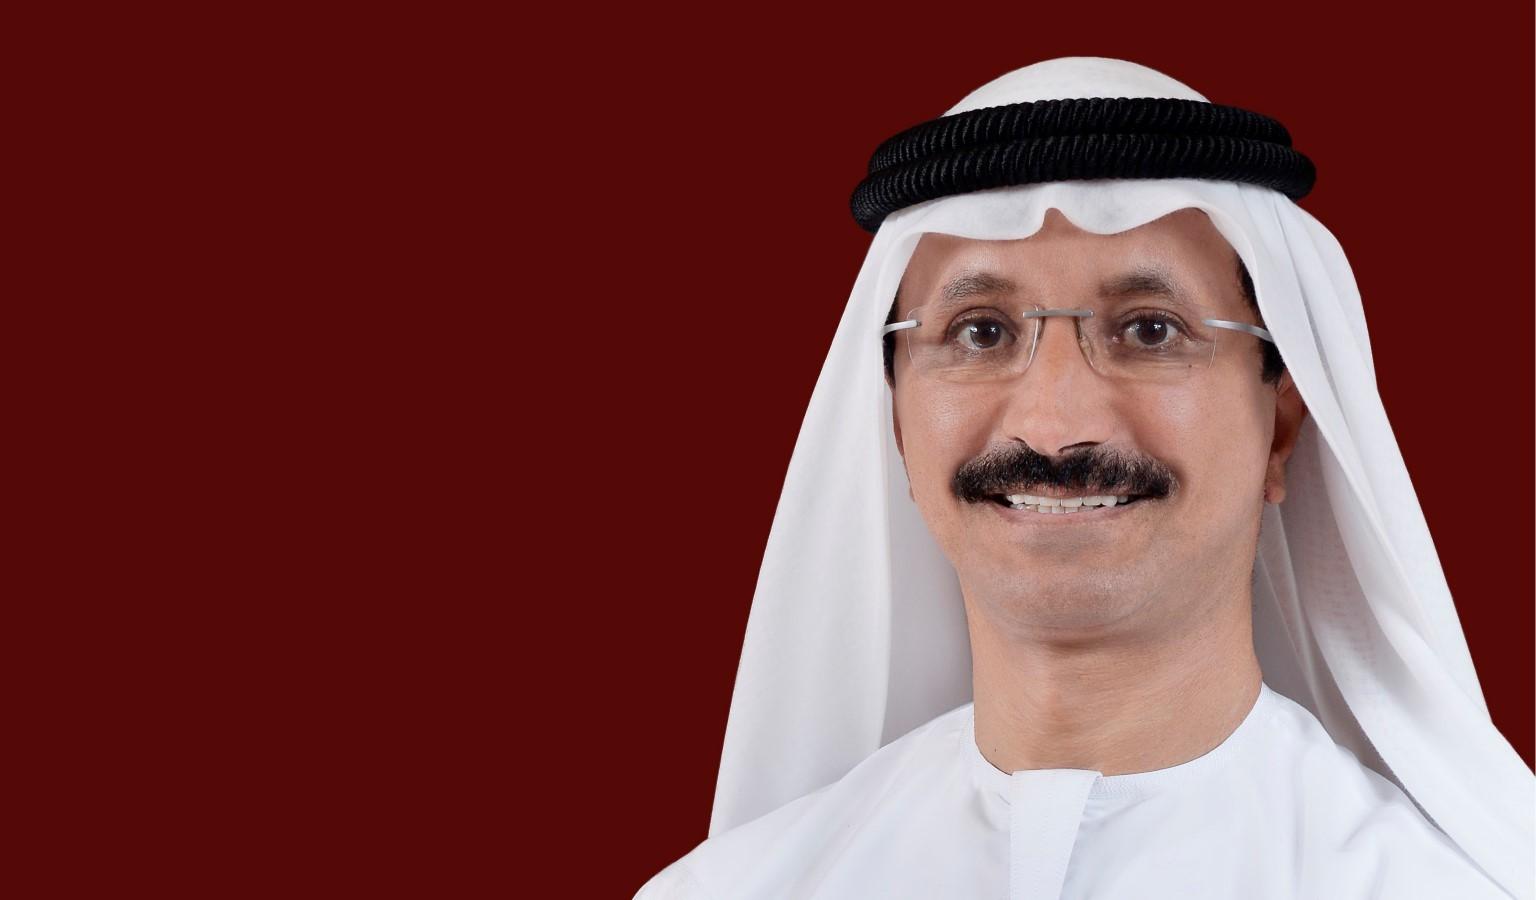 Dubai launches Maritime Advisory Council to strengthen position as